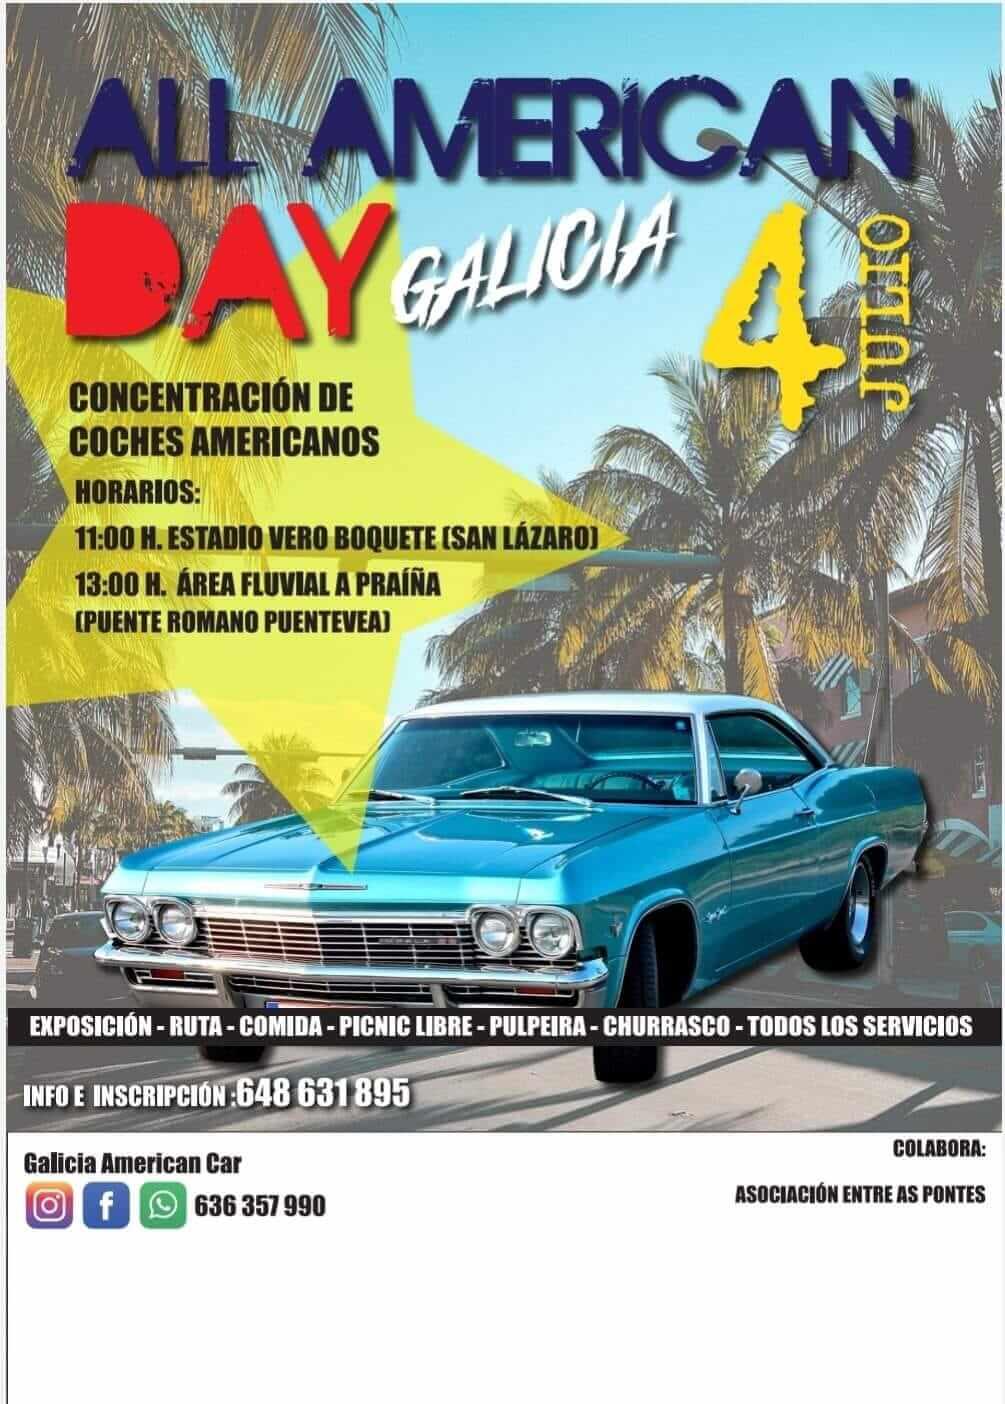 All American Day Galicia